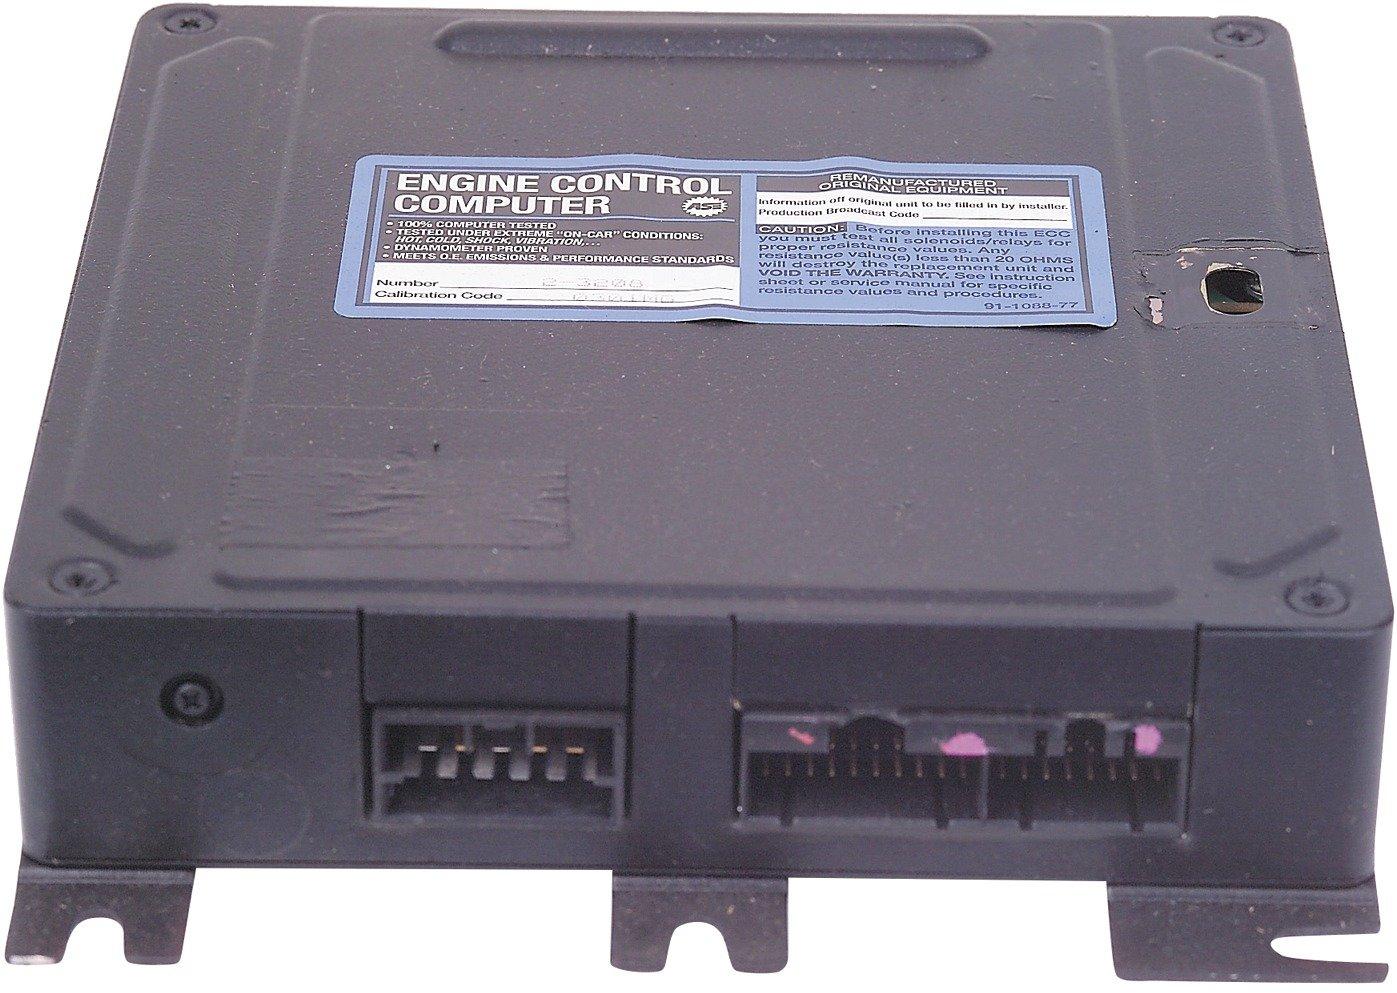 Cardone 72-3208 Remanufactured Import Computer A1 Cardone 723208AAF